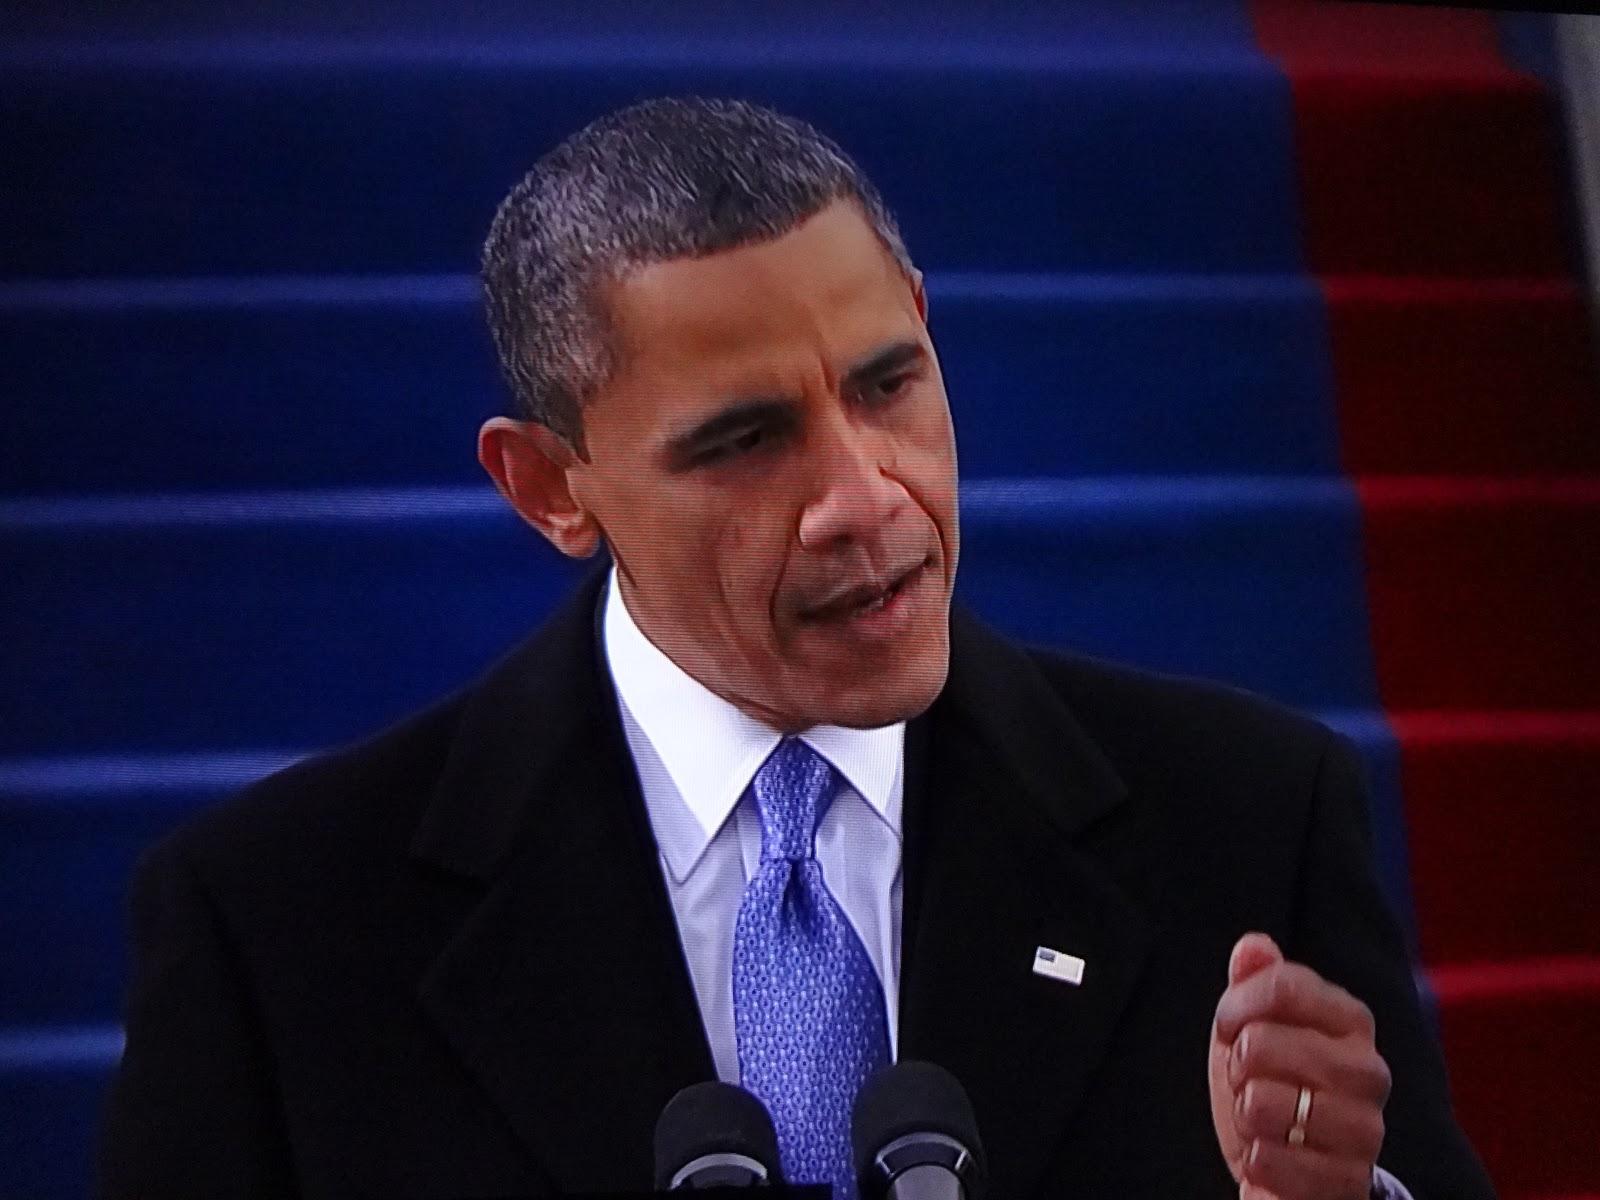 http://2.bp.blogspot.com/-gVv9I0gJ3_s/UP2X0wFuPVI/AAAAAAAAd_o/niiNeq8oS_M/s1600/OI+Obama+speech.JPG